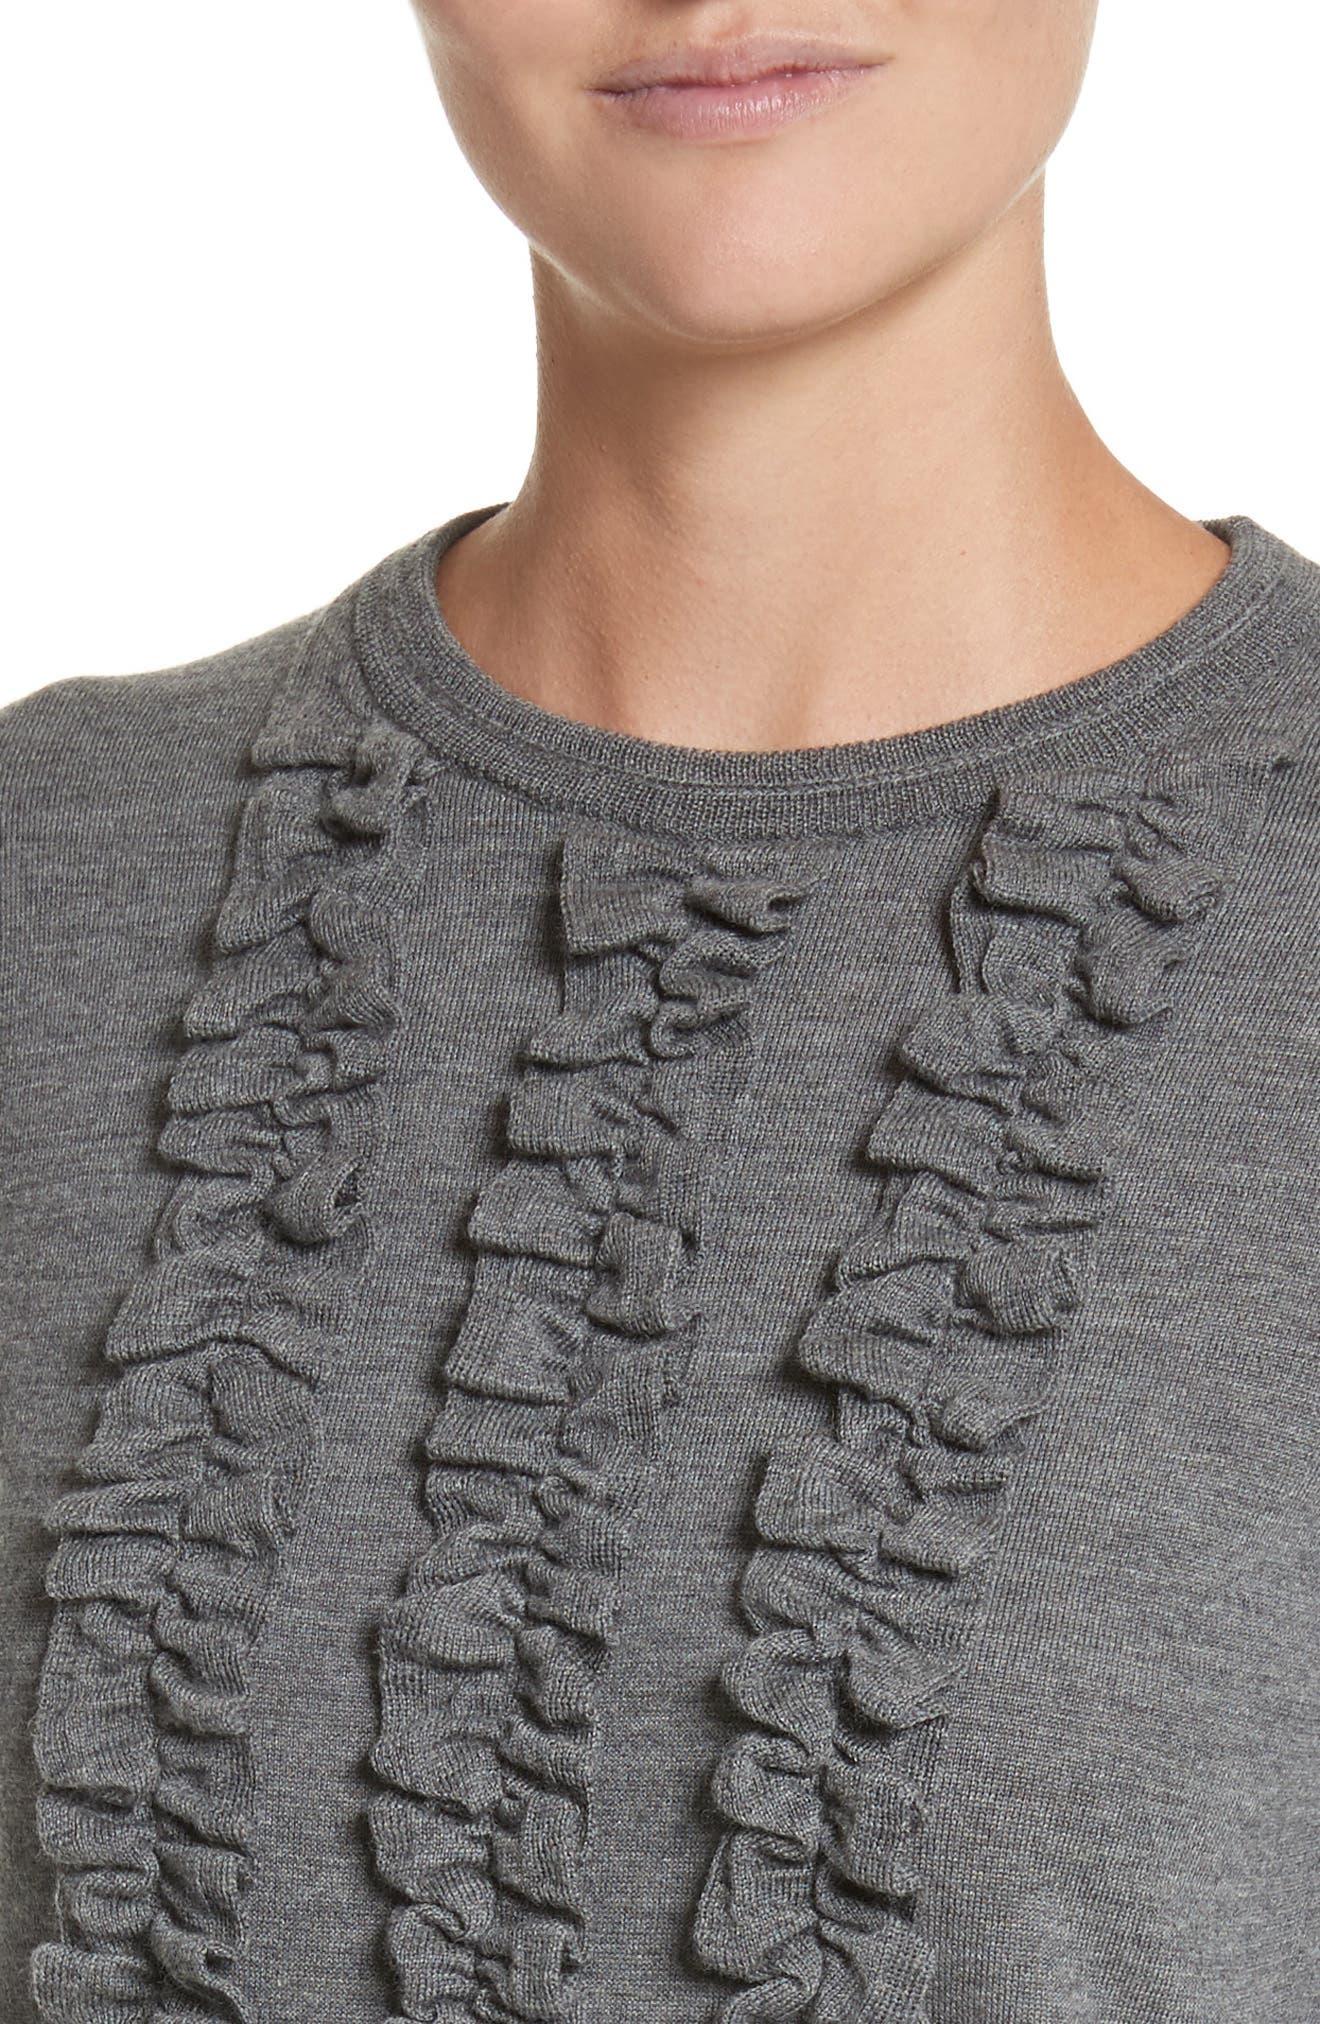 Ruffle Merino Wool Sweater,                             Alternate thumbnail 4, color,                             Dark Grey Melange